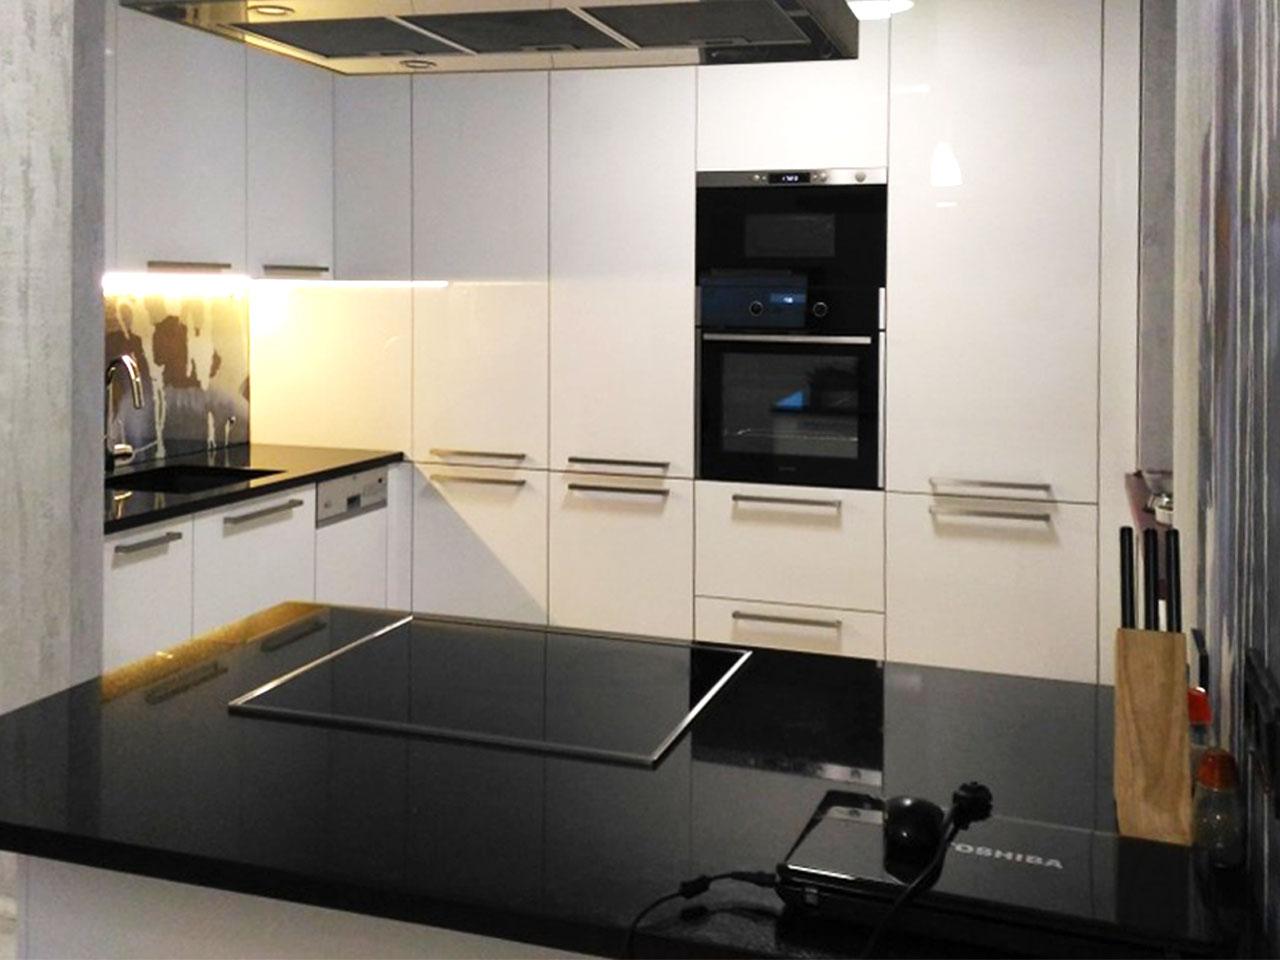 Фото. Встроенная кухня на заказ. Цена 210 тыс. рублей